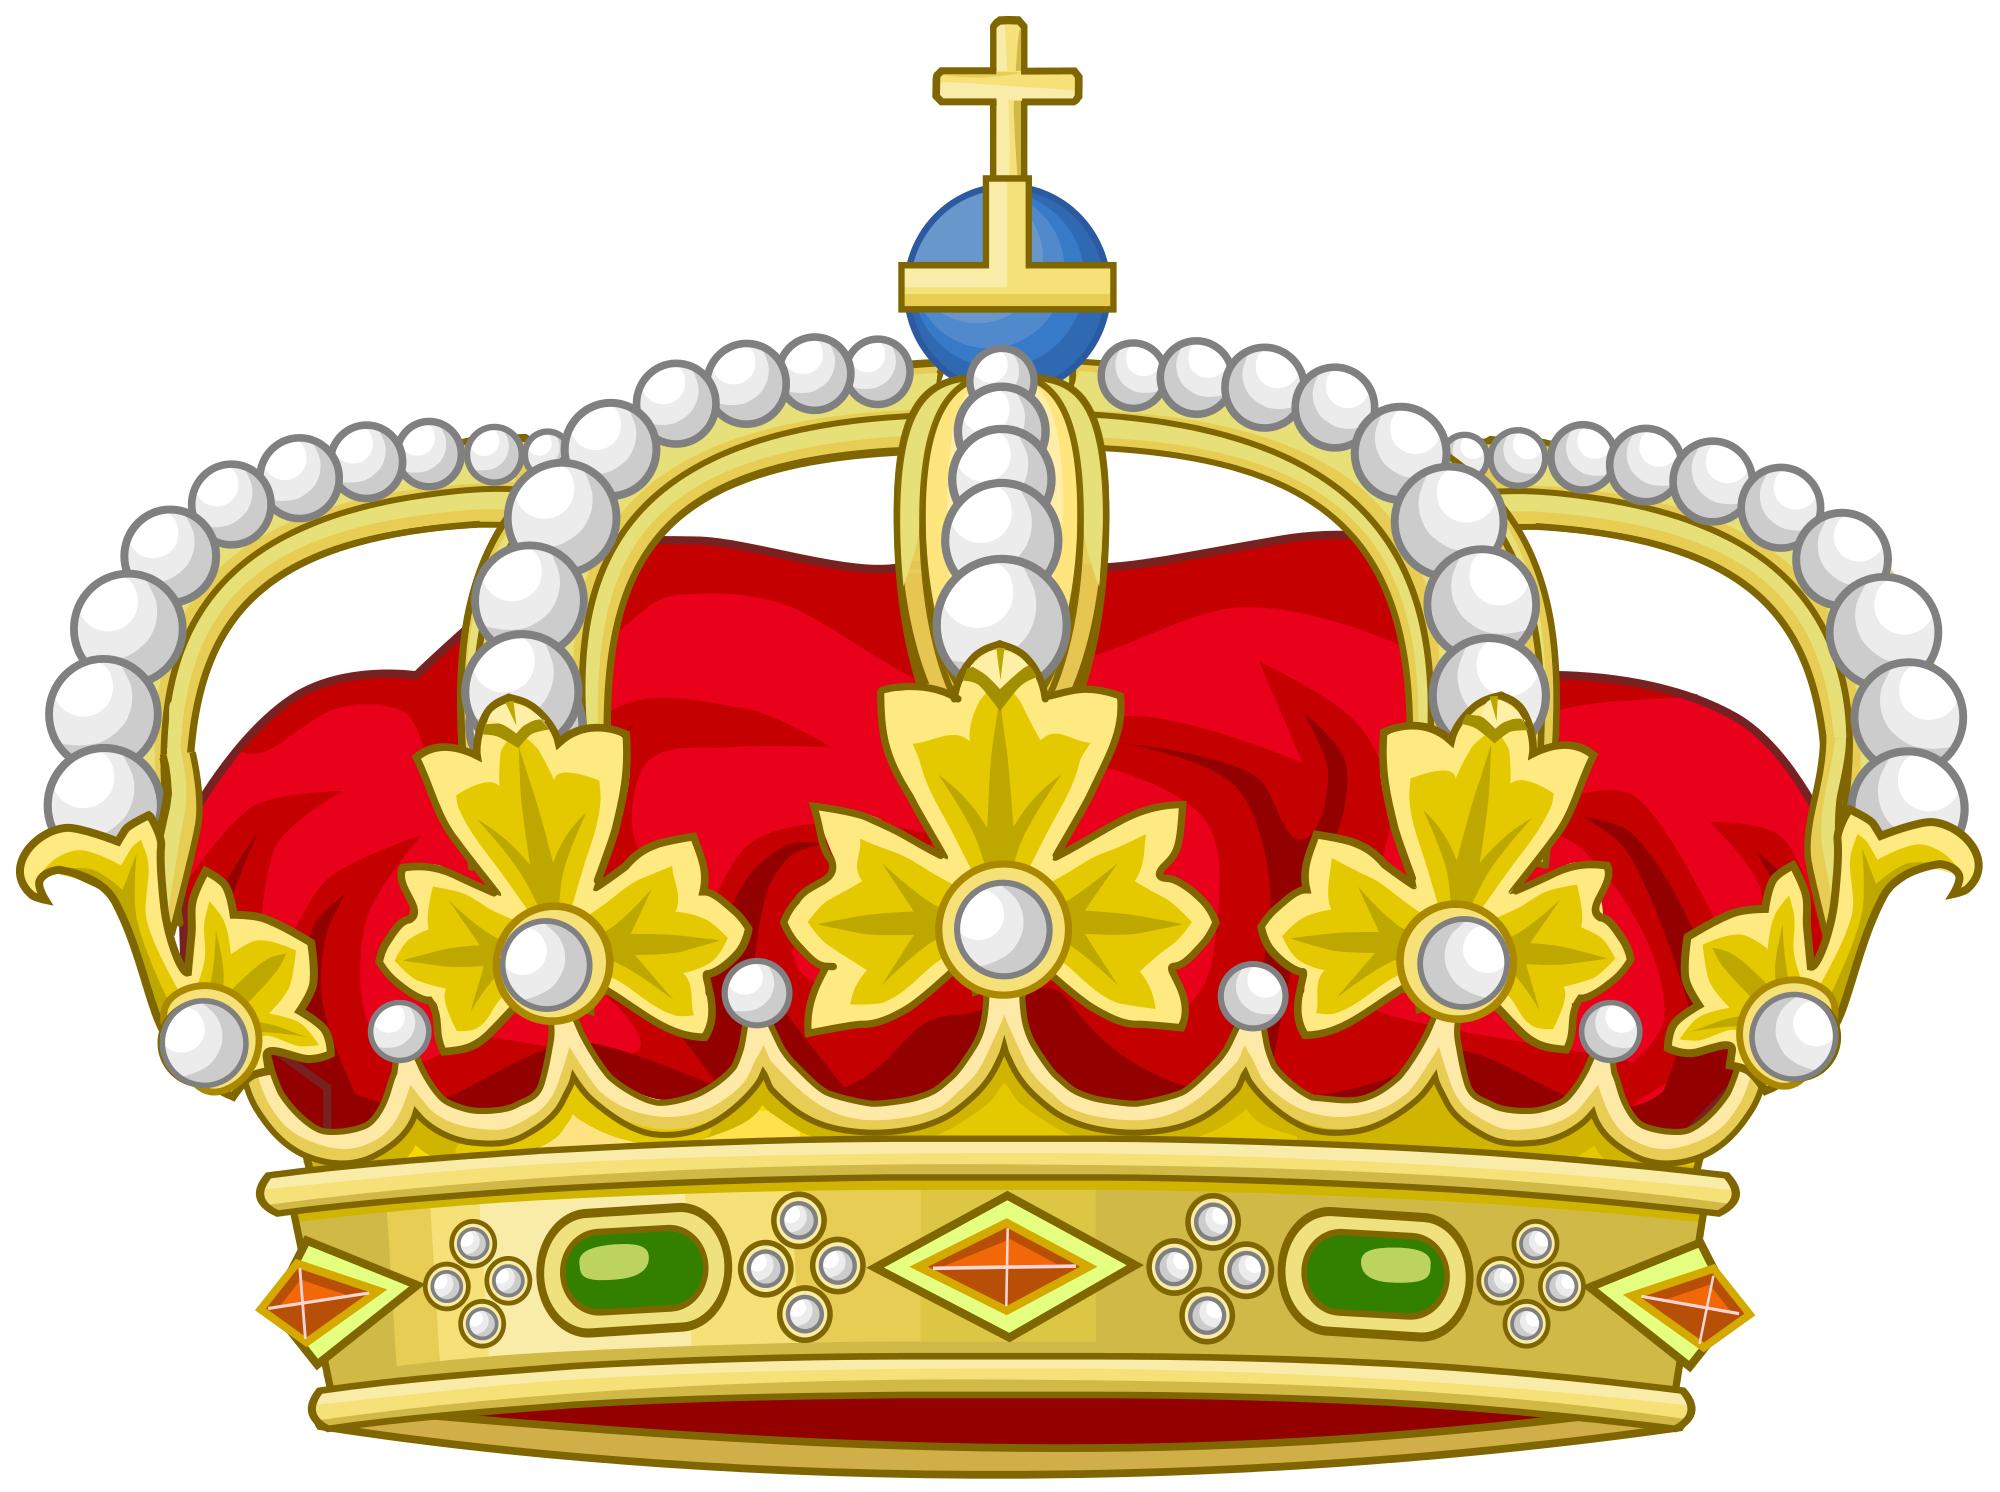 15 crown clipart banner transparent download Spain crown clipart banner transparent download